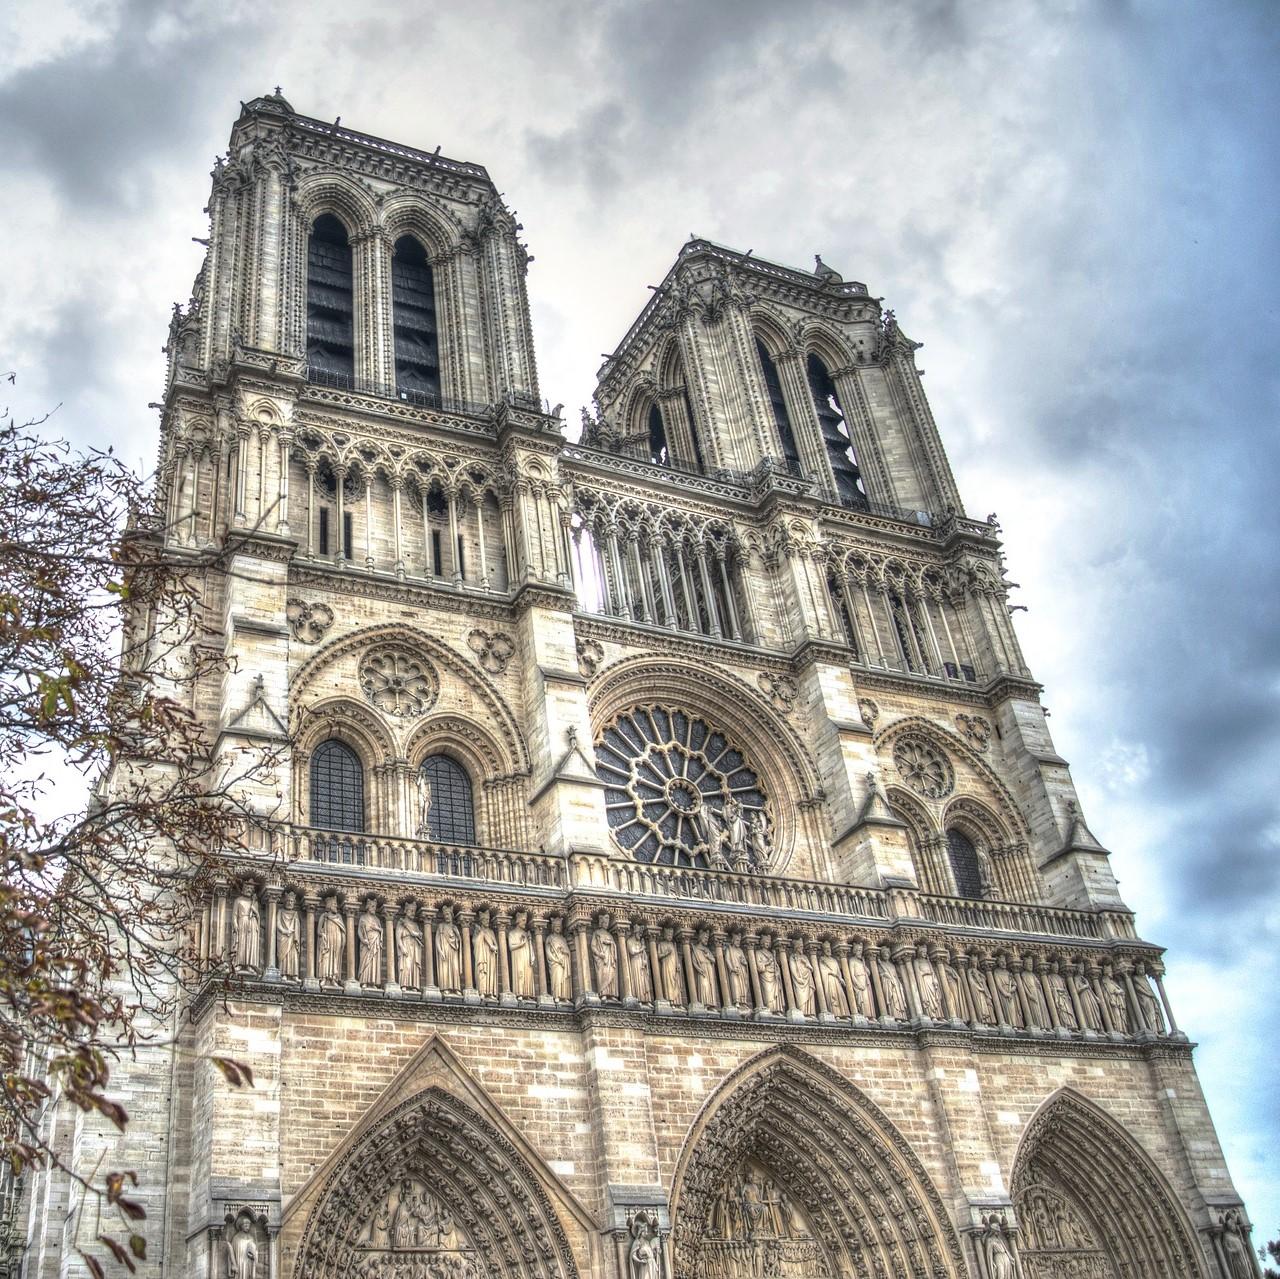 De Nôtre Dame van Parijs